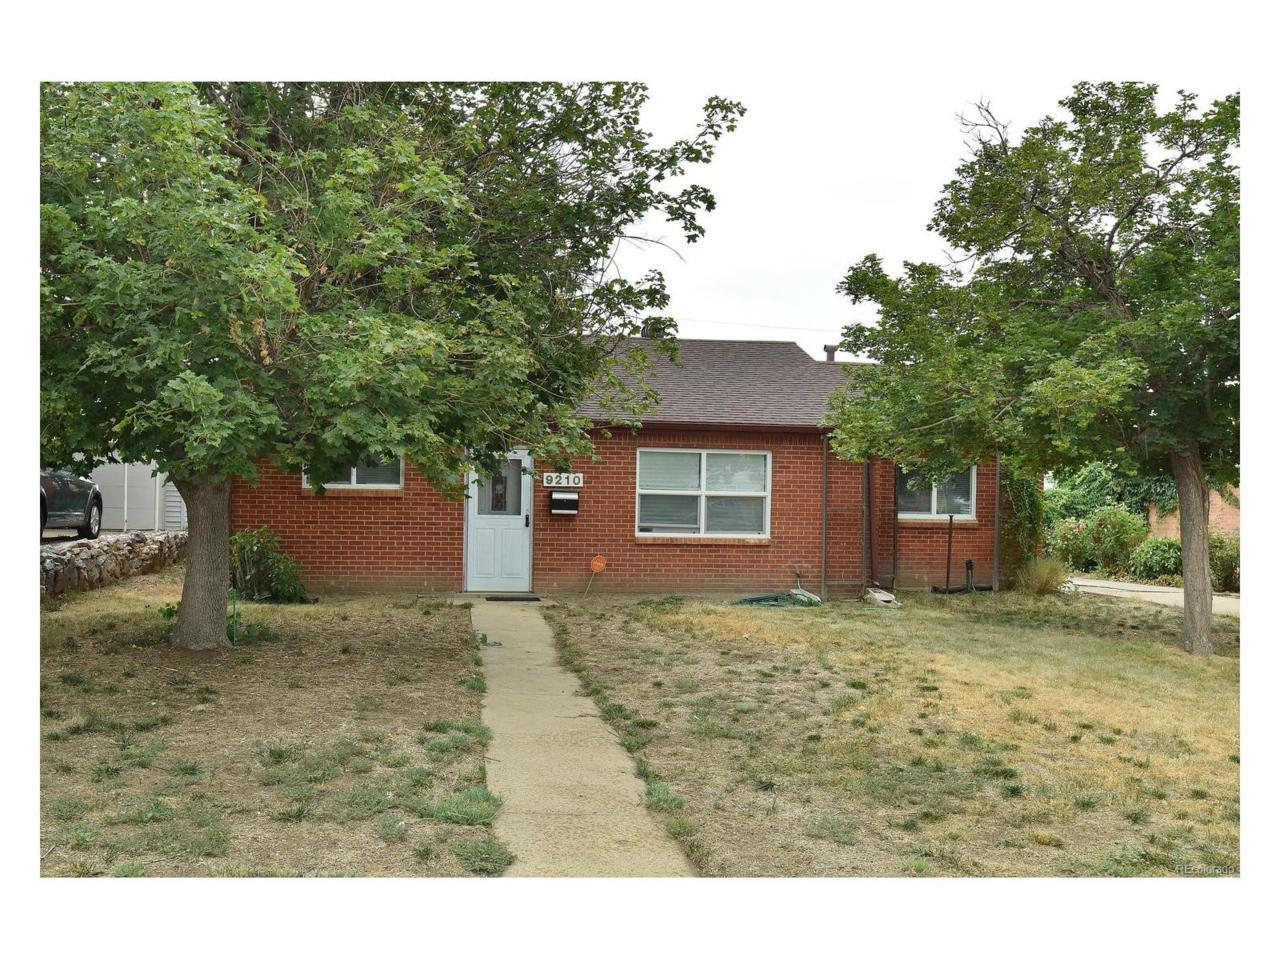 9210 Vine Street, Thornton, CO 80229 (MLS #4790247) :: 8z Real Estate